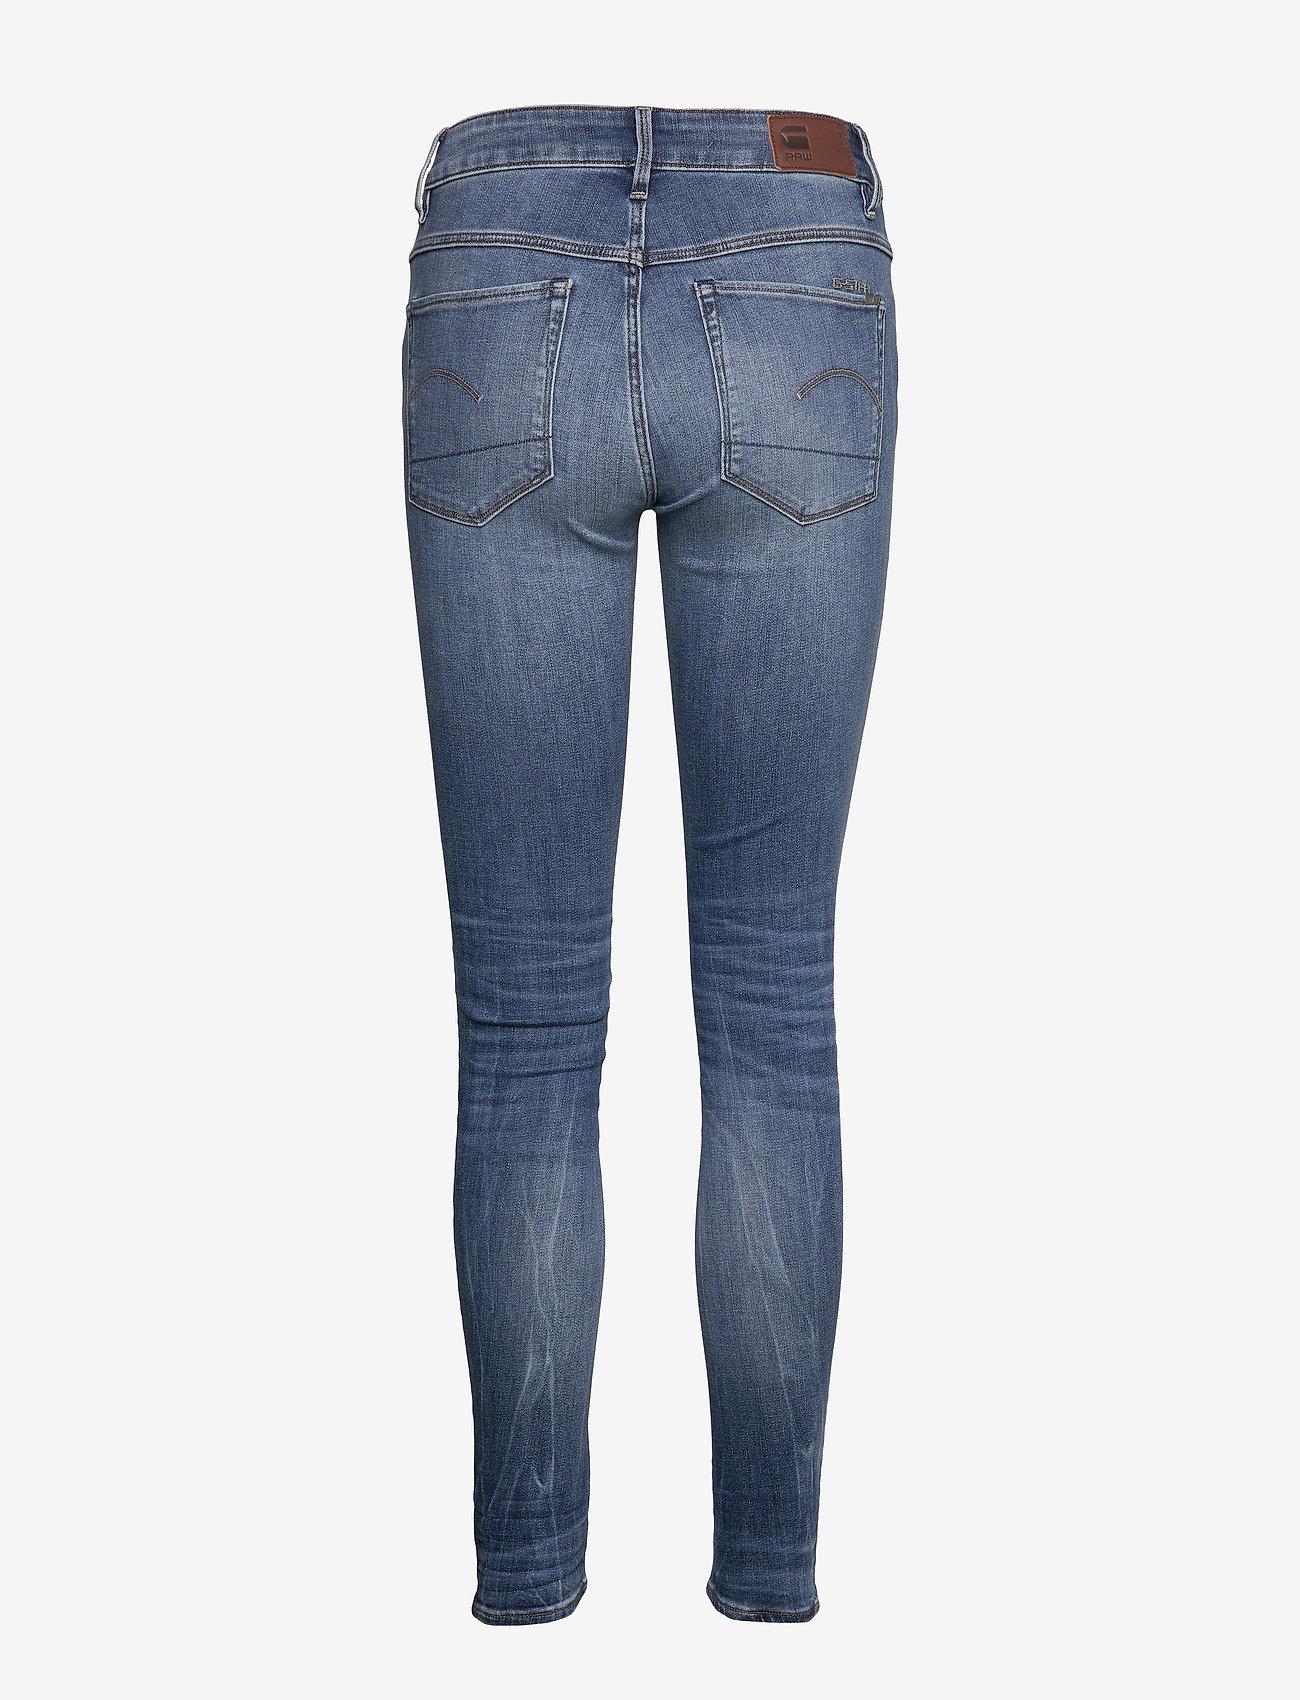 G-star RAW - 3301 High Skinny Wmn - skinny jeans - medium indigo aged - 1